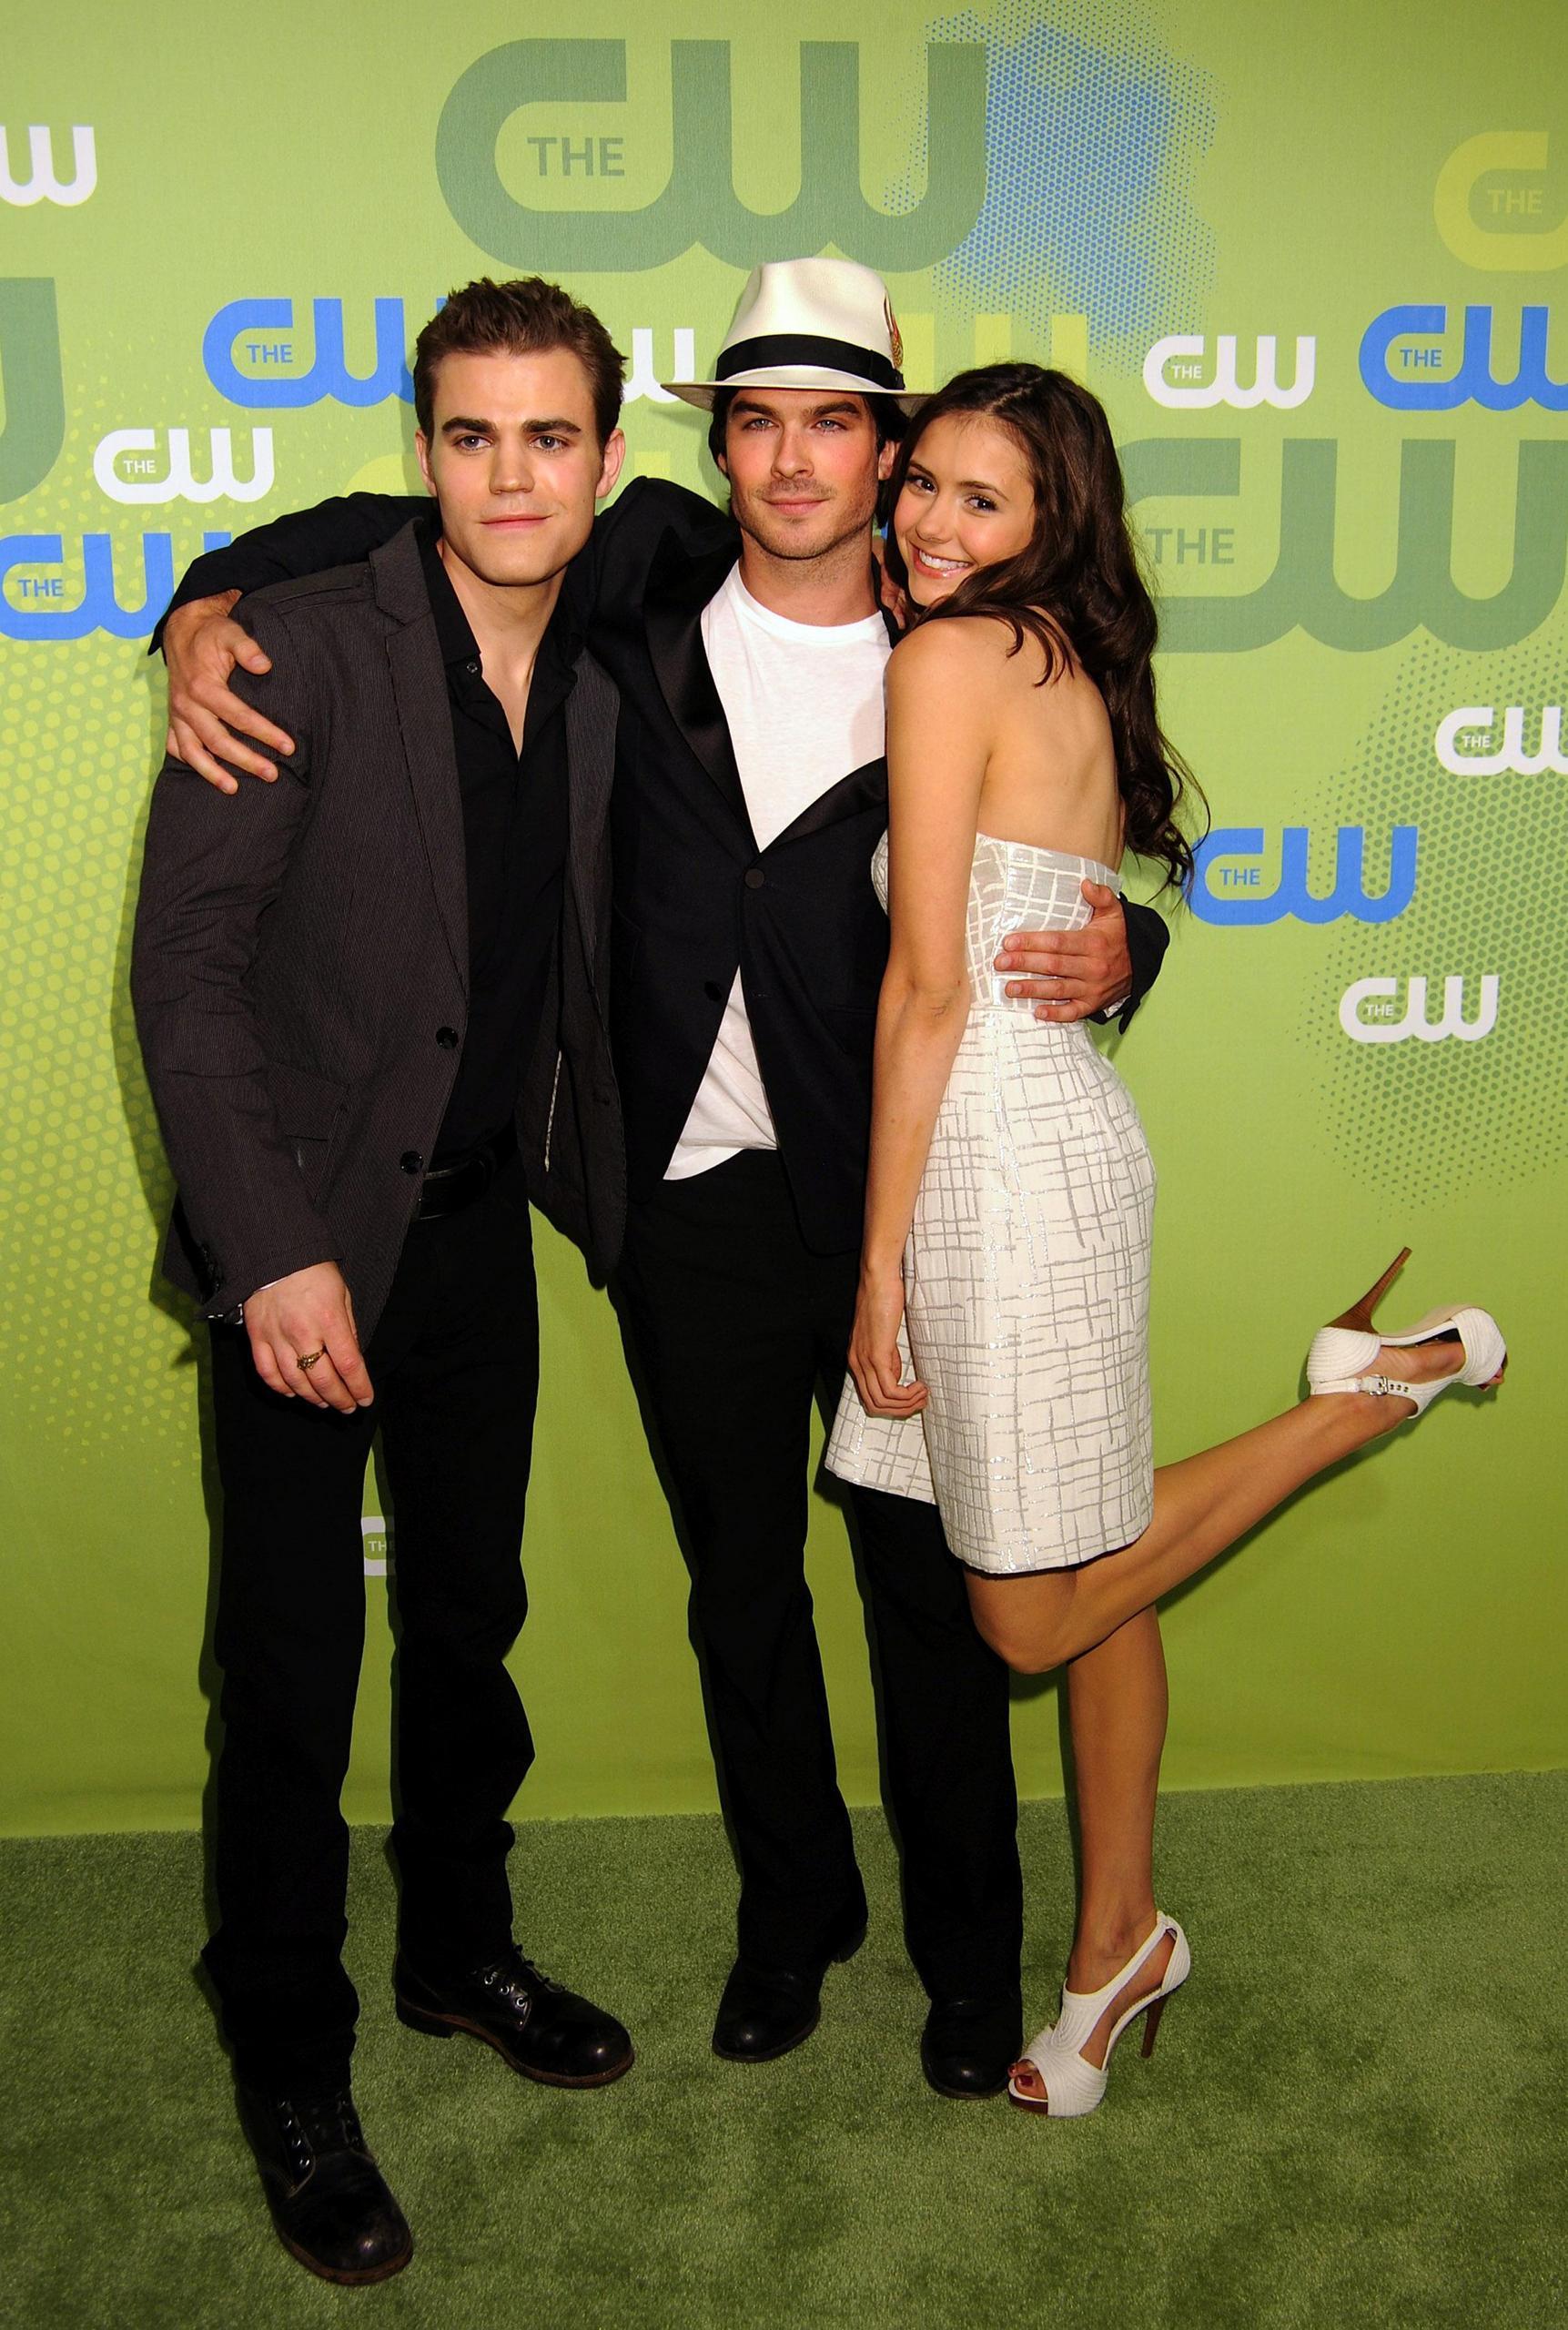 Nina Dobrev And Paul Wesley Kissing Off Set Cast CW - The Vampire ...